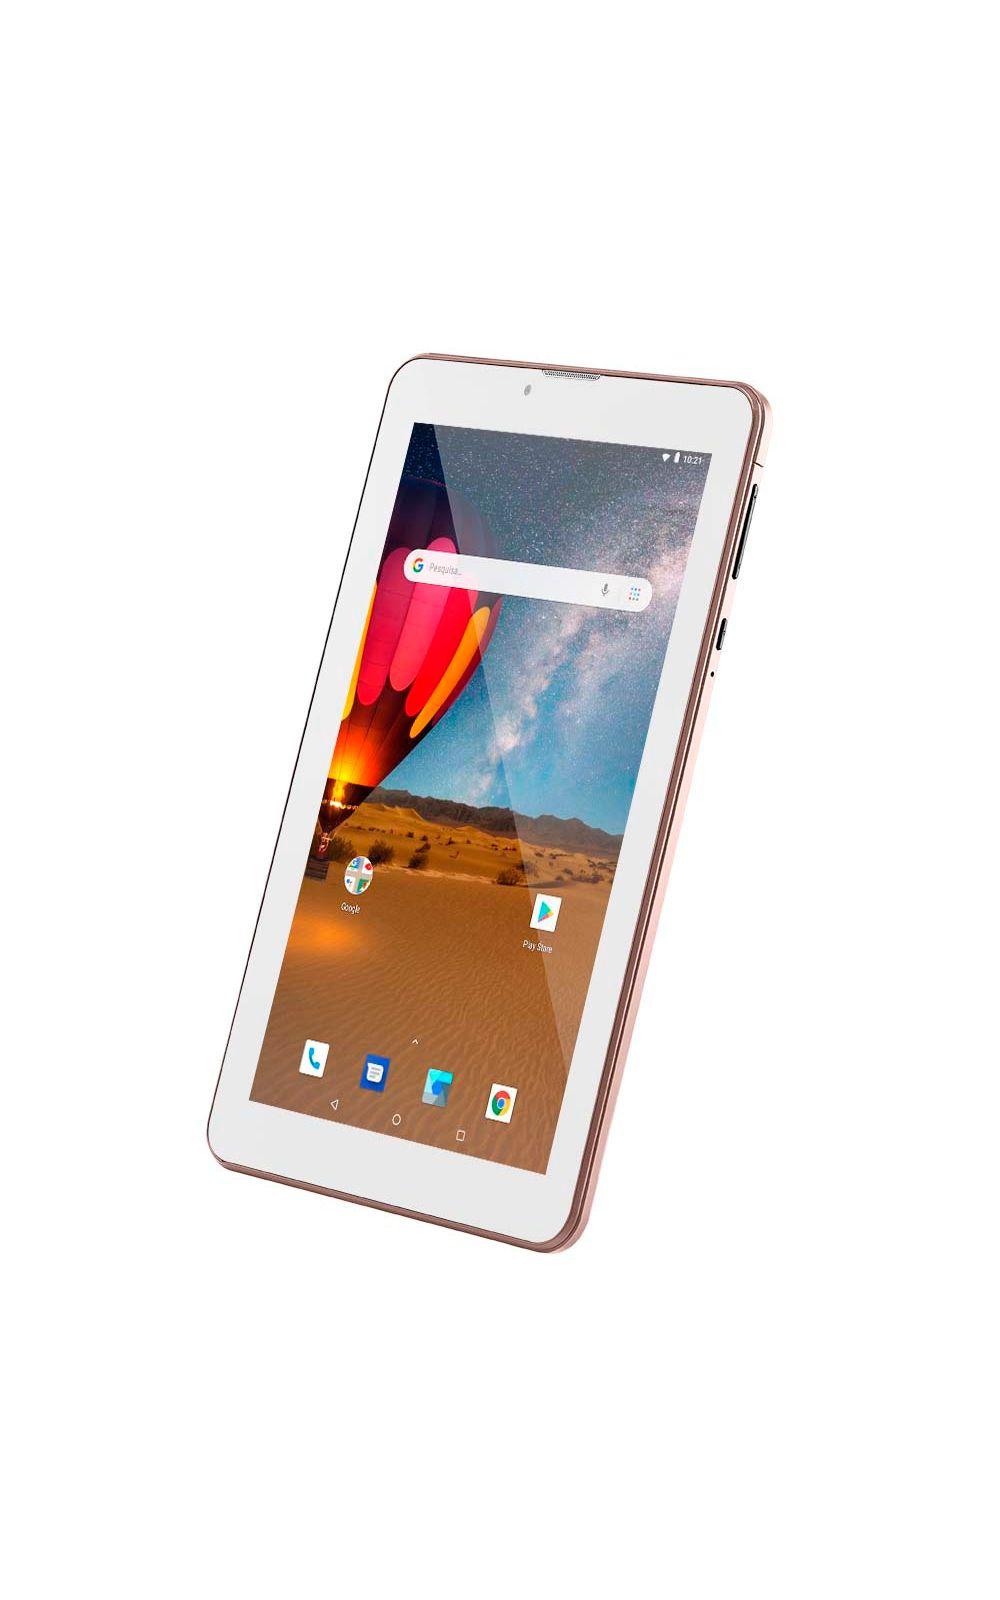 Foto 8 - Tablet Multilaser M7 3G Plus Dual Chip Quad Core 1 GB de Ram Memória 16 GB Tela 7 Polegadas Rosa - NB305